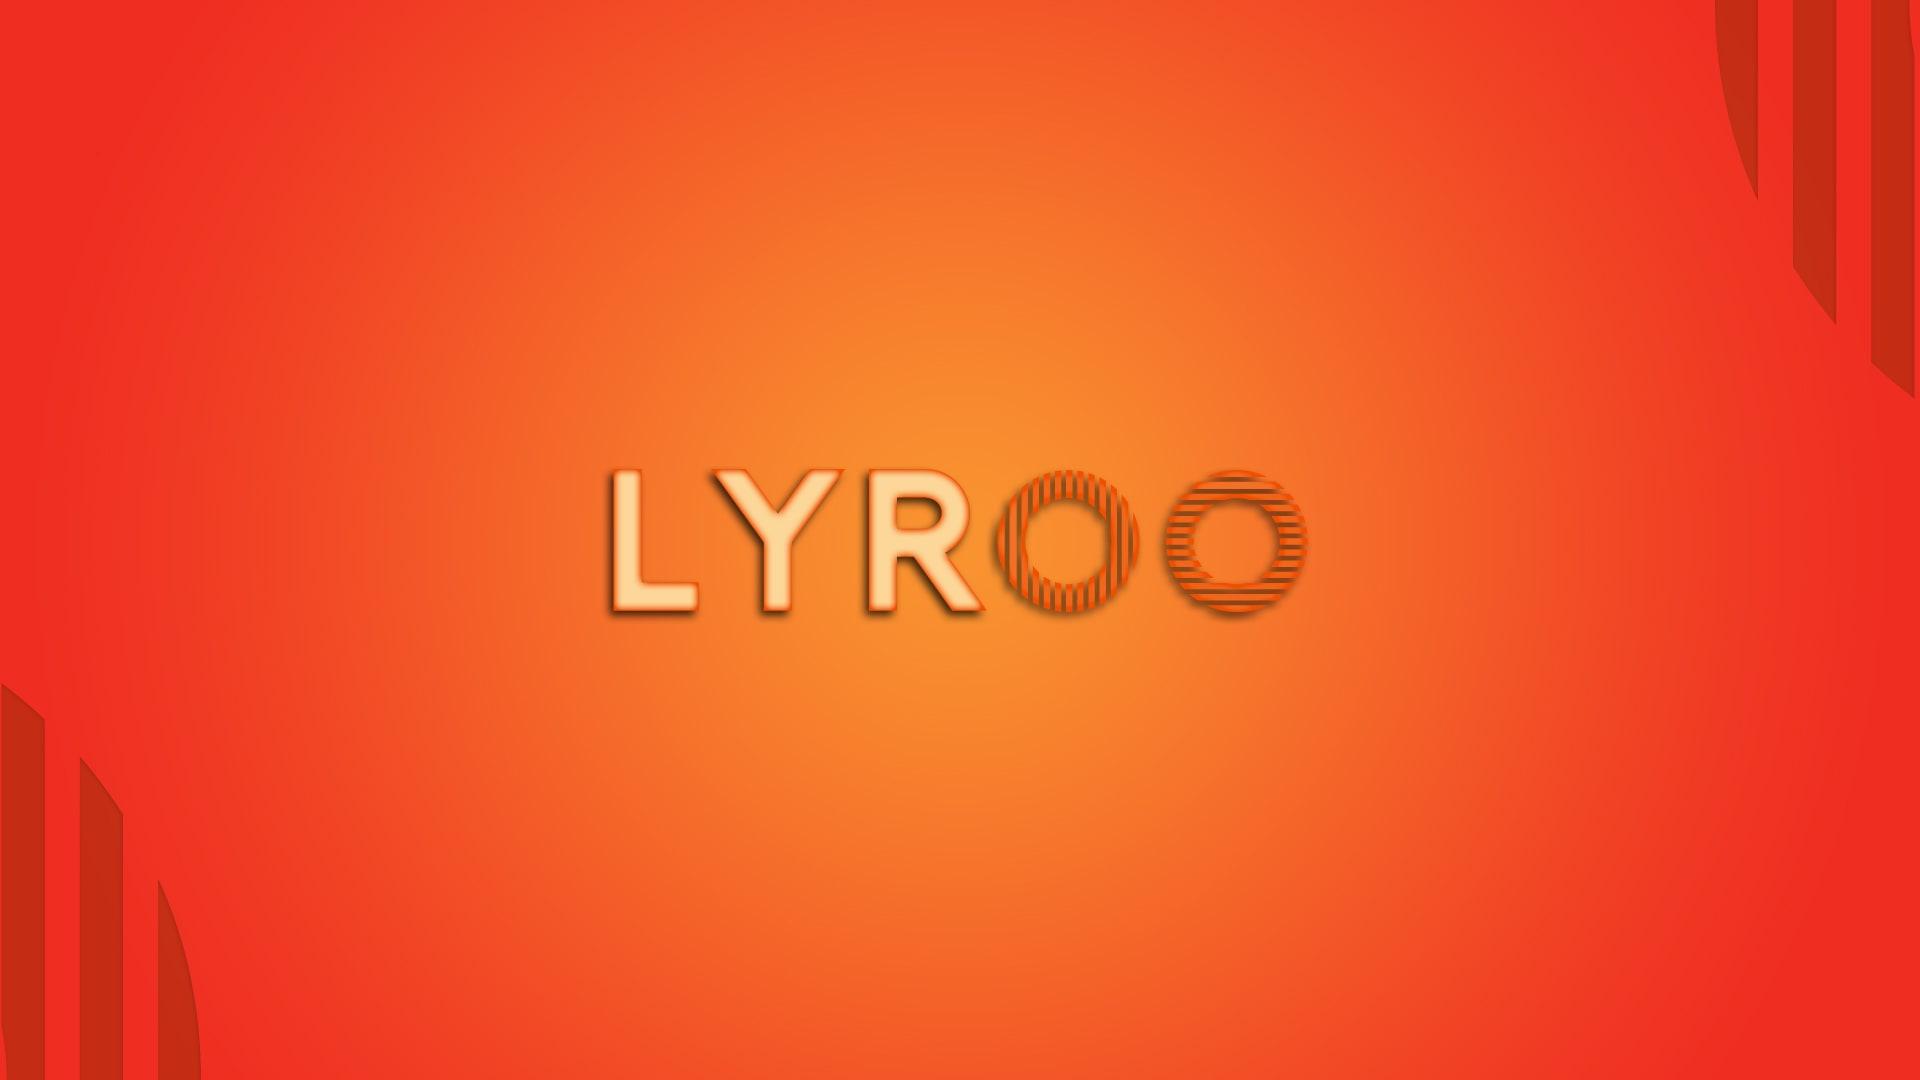 Lyroo – Lyrics Company Wallpaper Image